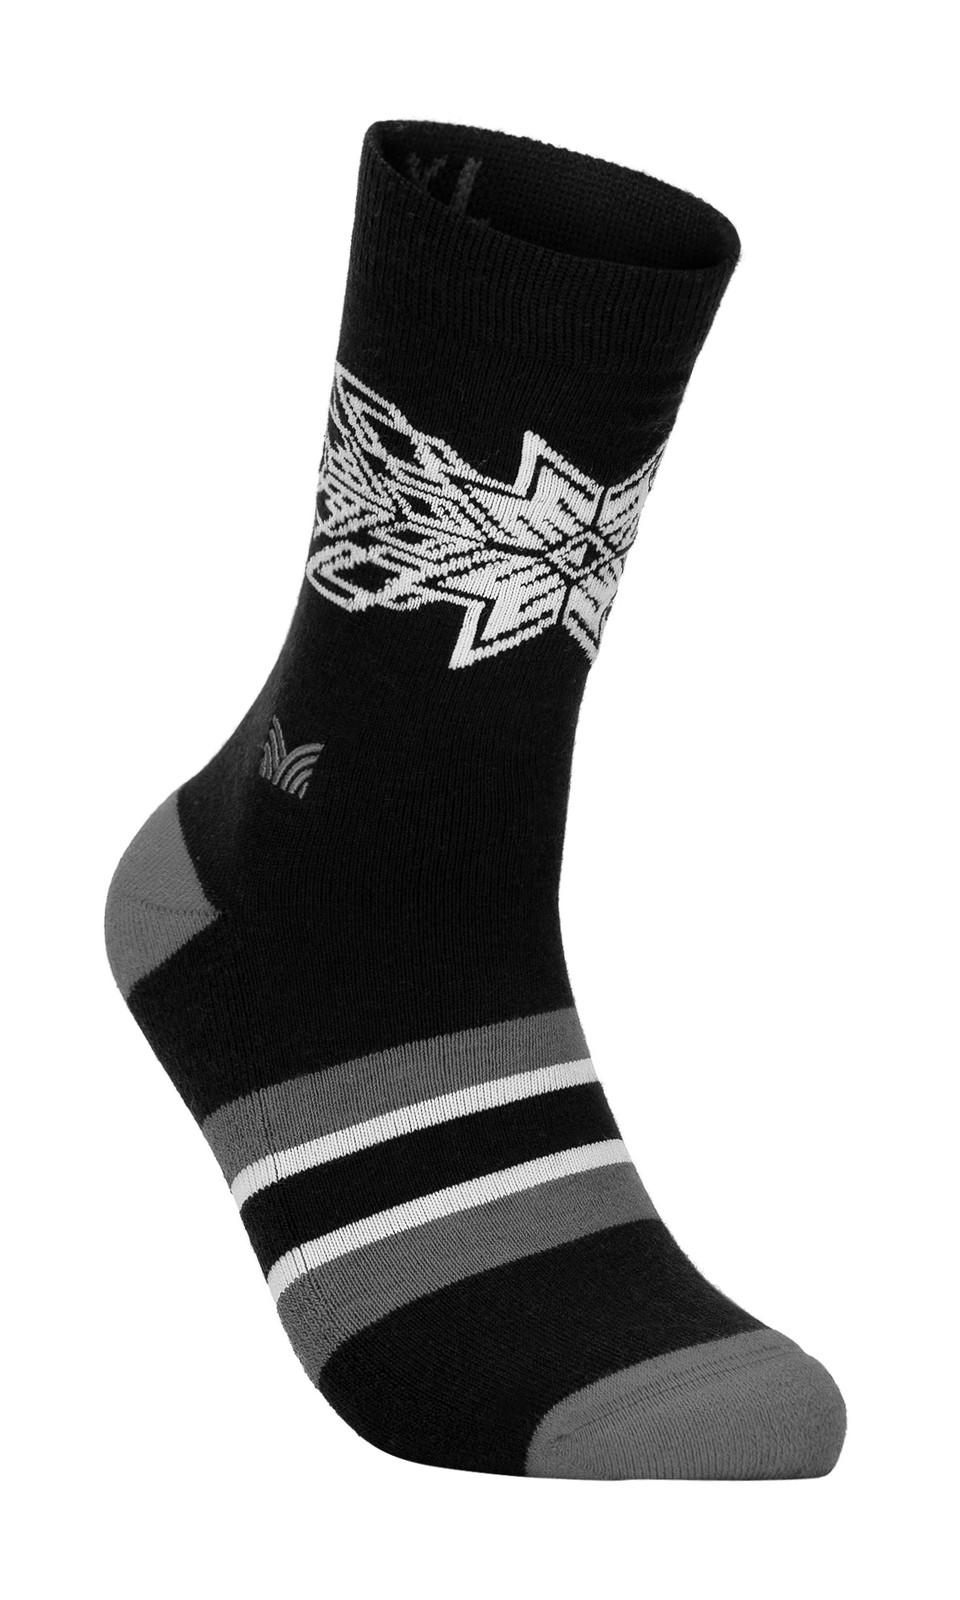 Dale of Norway OL Spirit Sock, Dark Charcoal/Smoke/Off White, 50121EOL Spirit Sock, Dark Charcoal/Smoke/Off White, 50121E